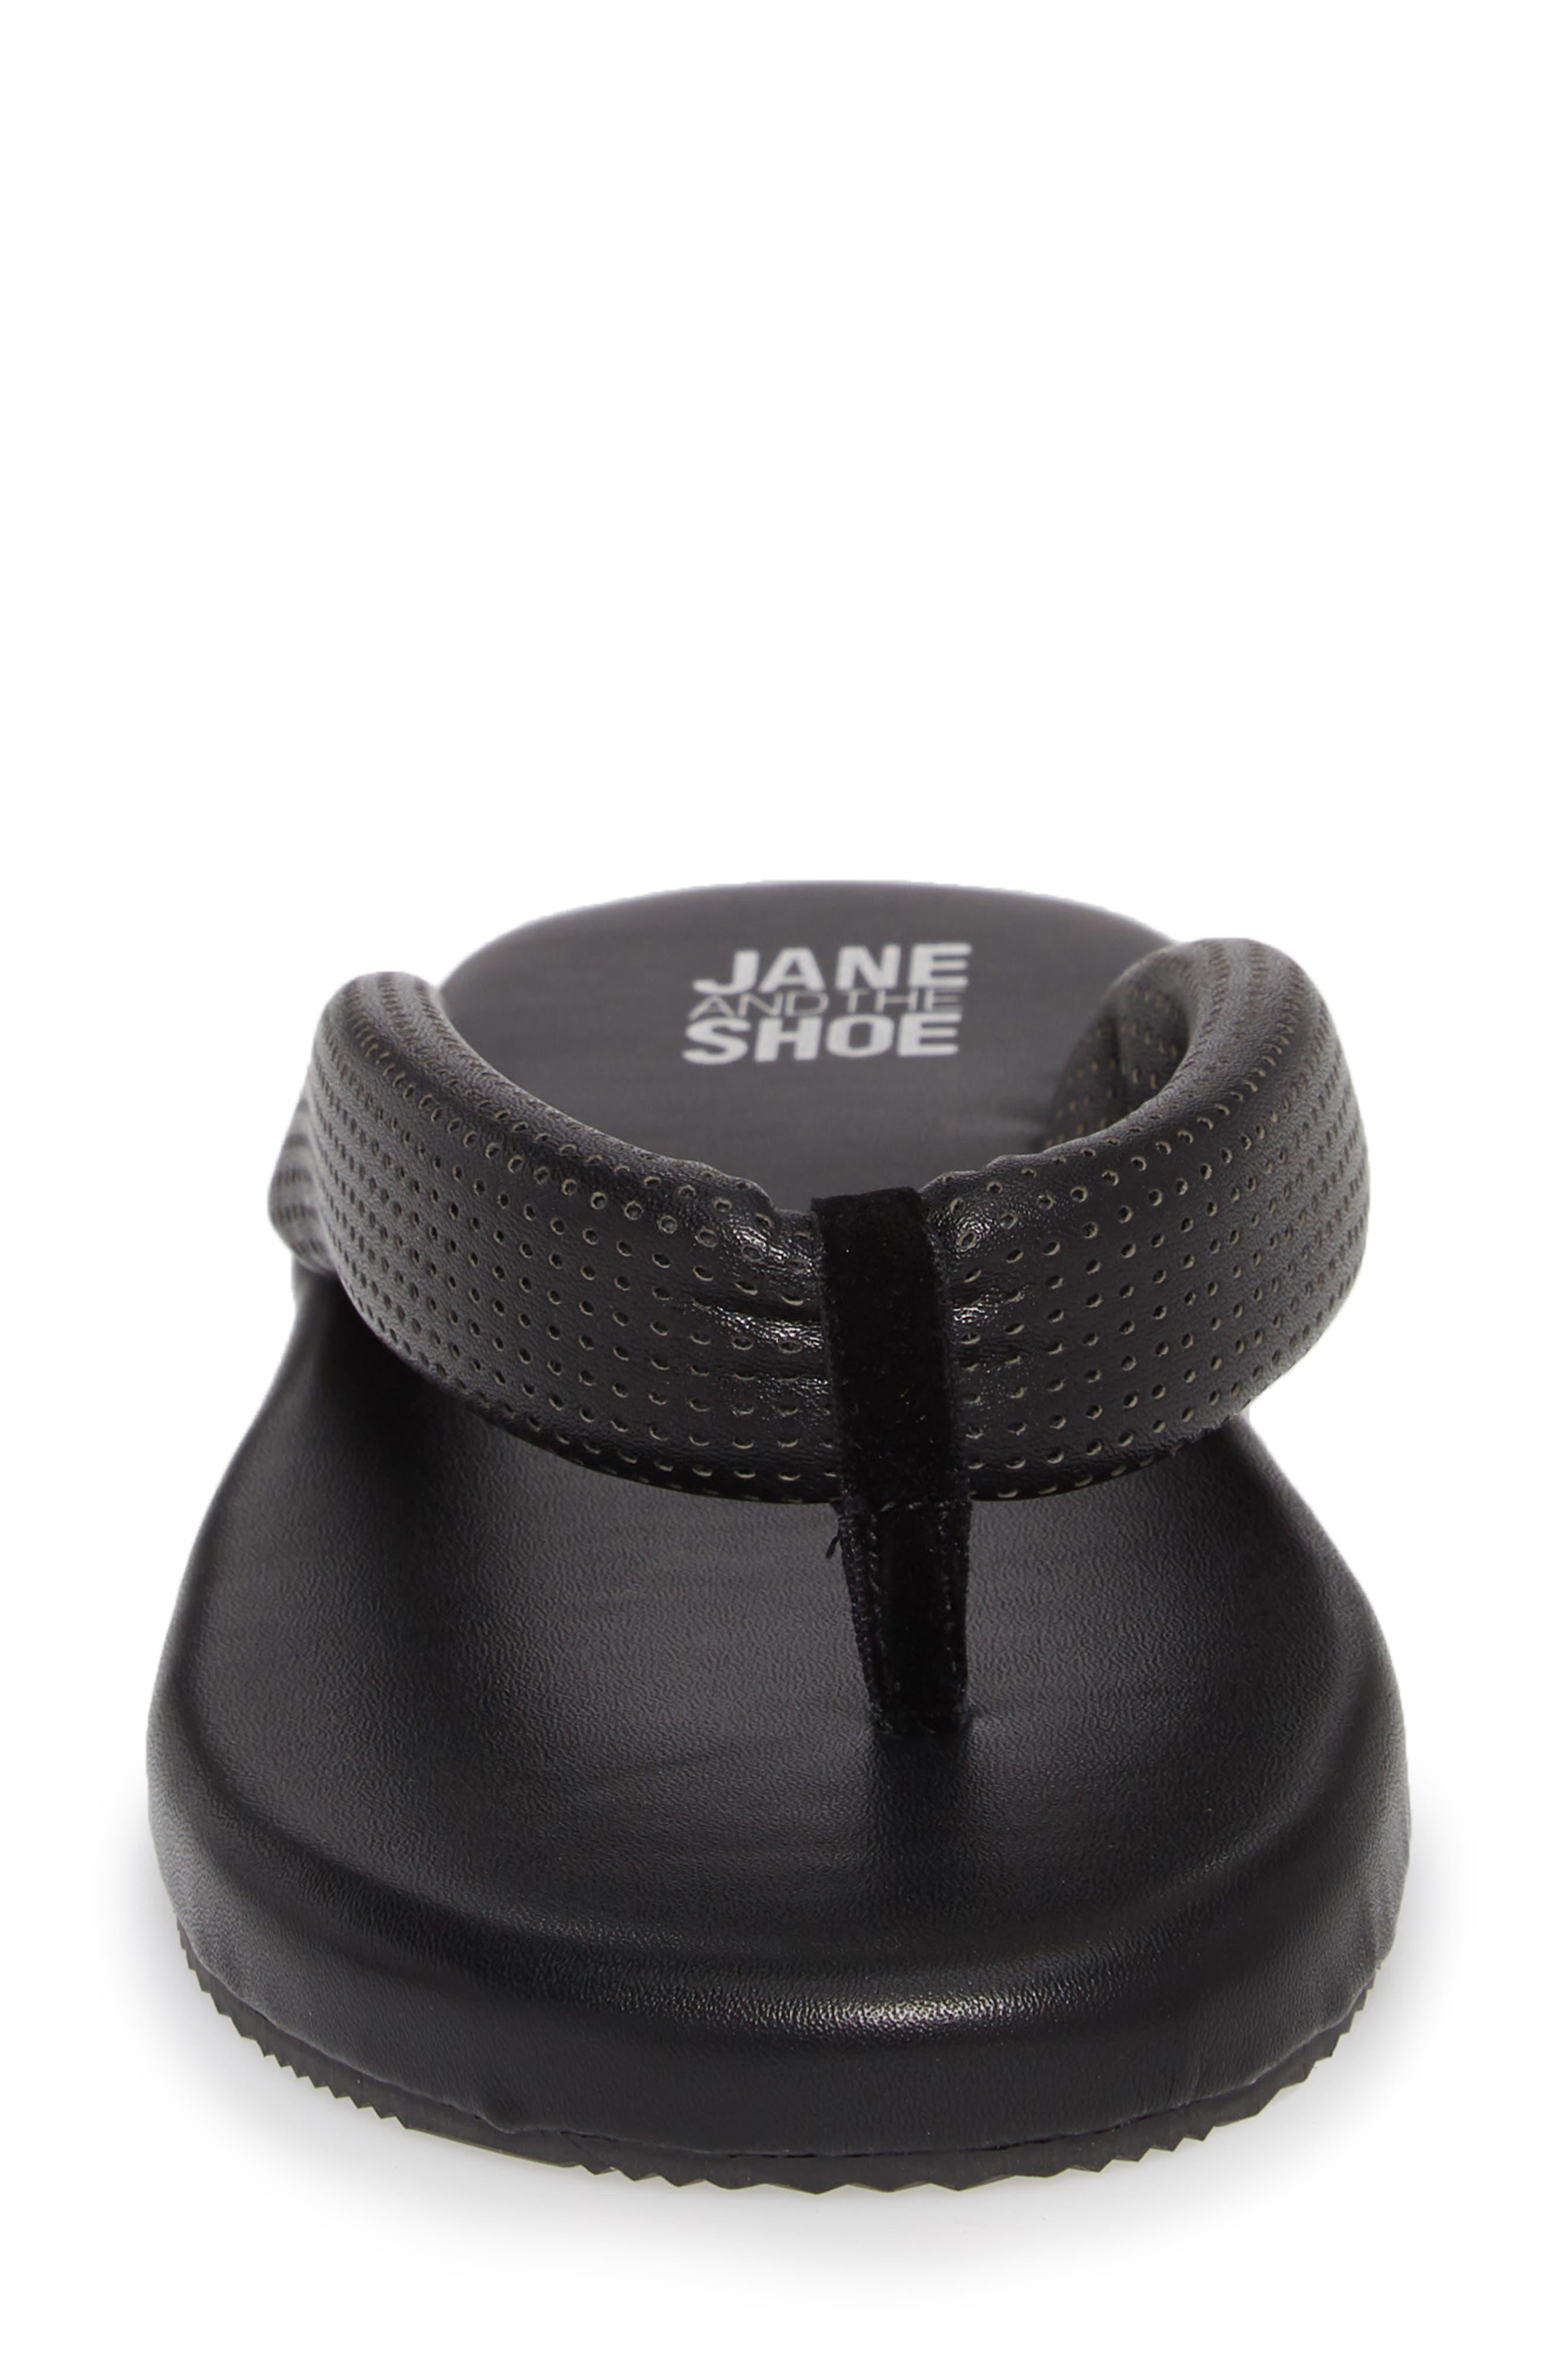 Jaime Plush Flip Flop,                             Alternate thumbnail 4, color,                             BLACK